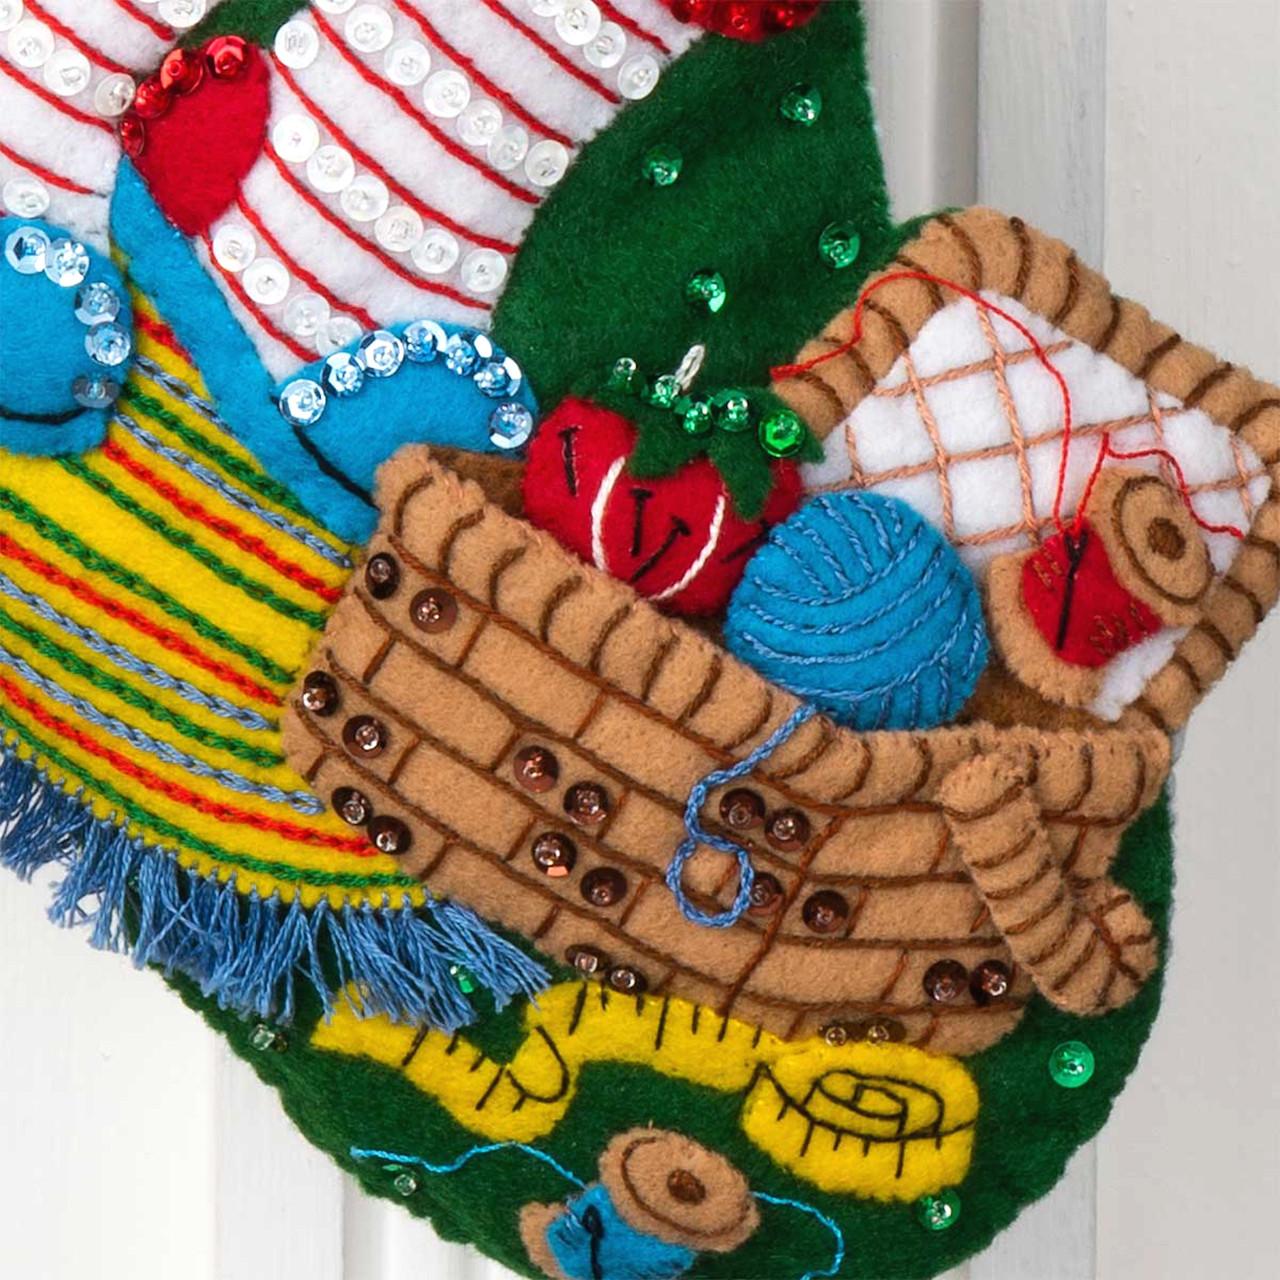 Plaid / Bucilla - Stitching Santa Christmas Stocking